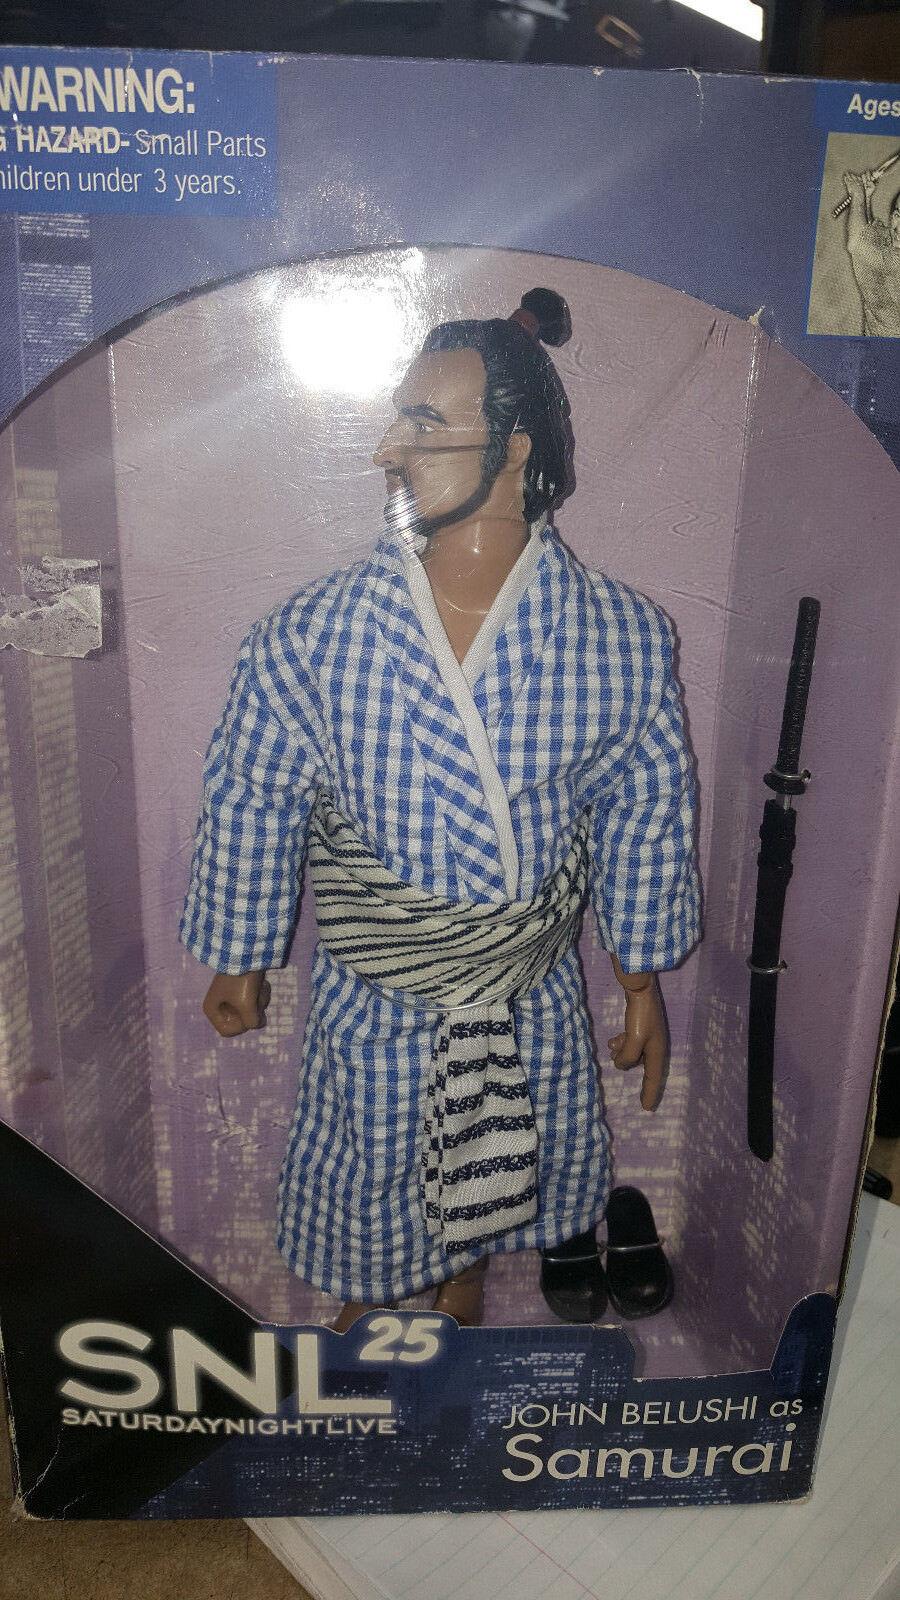 John Belushi SNL as Samurai figure Creation Entertainment 2000